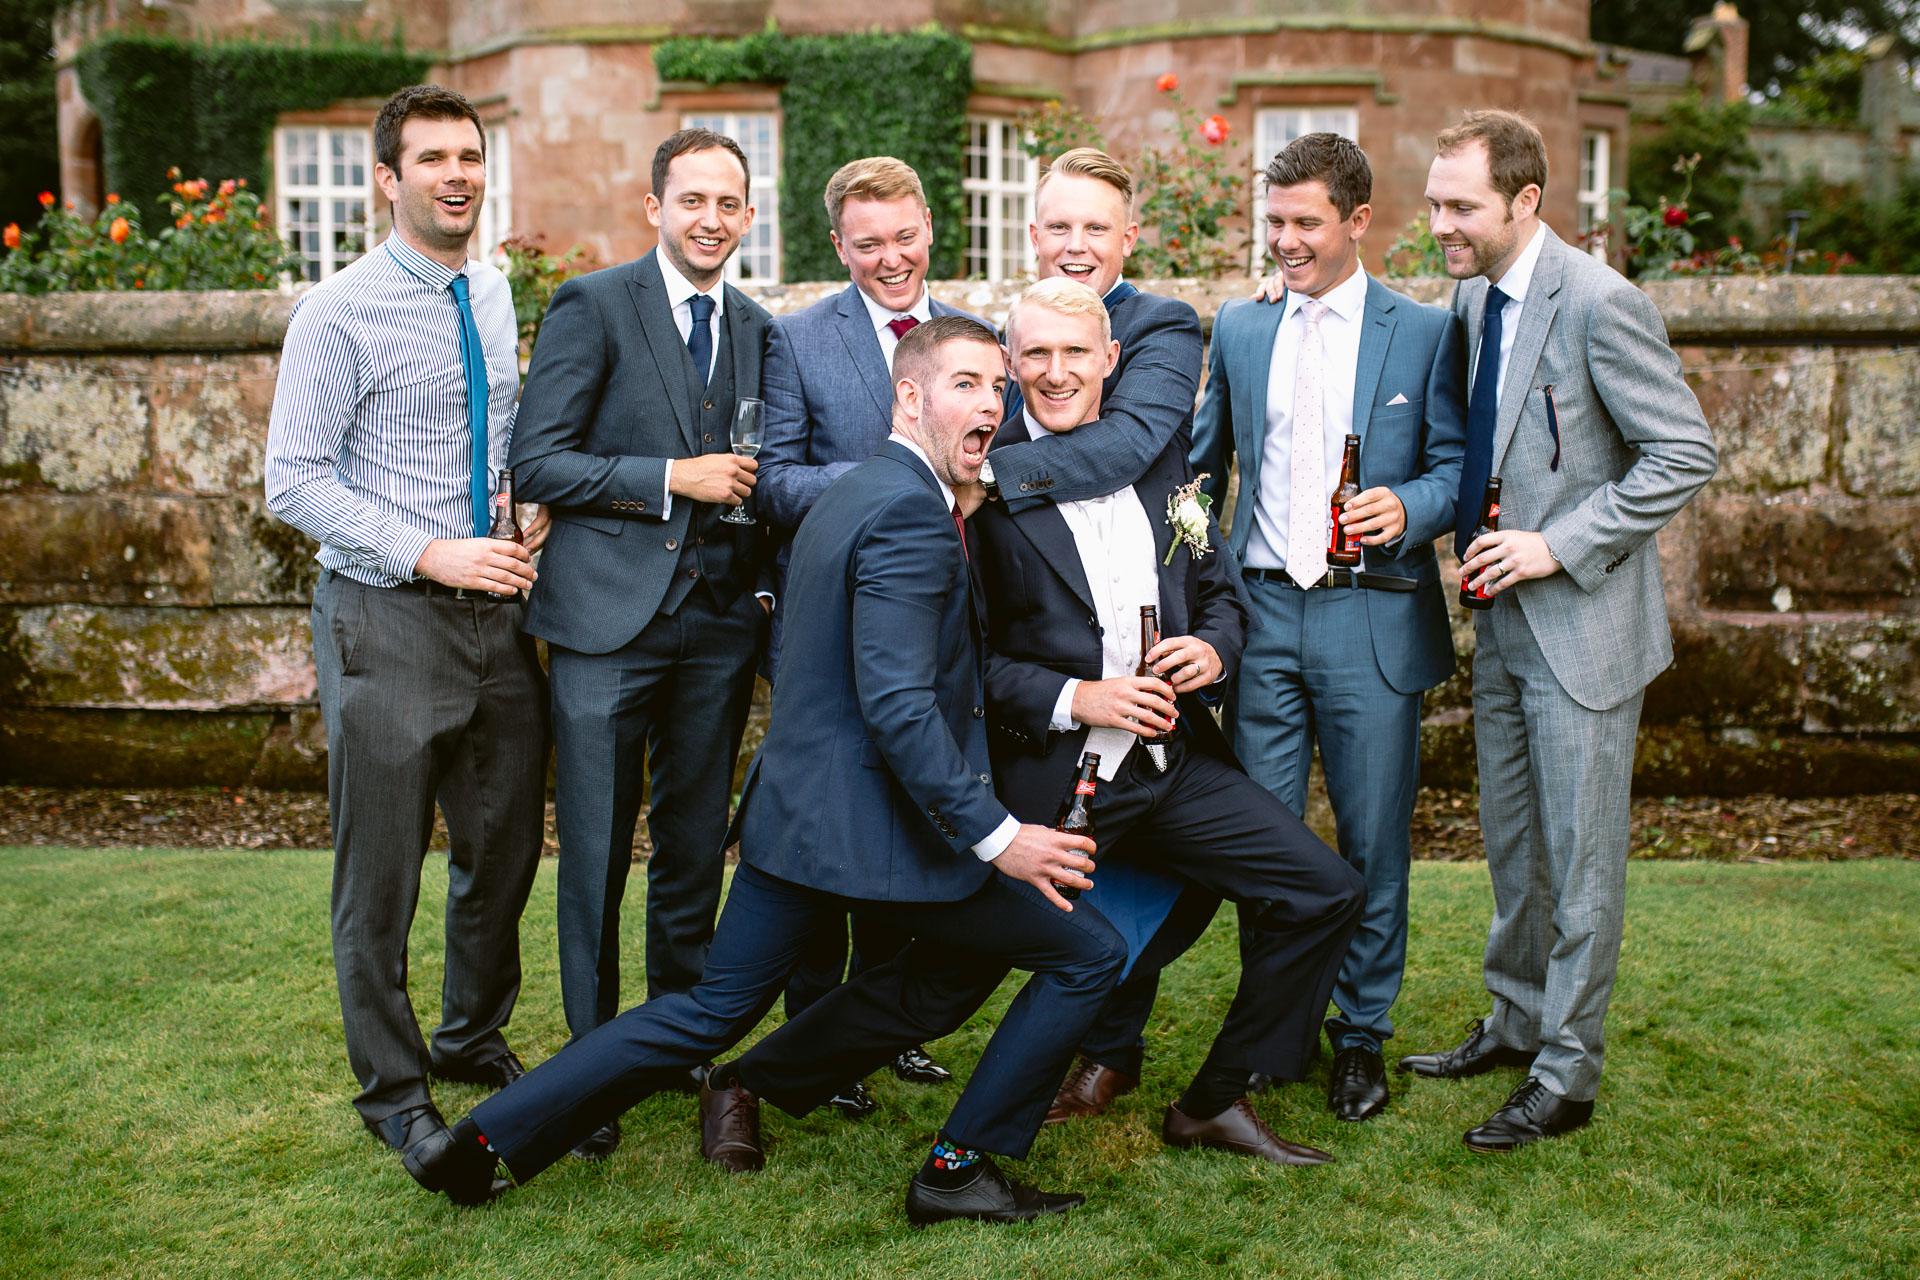 The Citadel wedding Shropshire Sarah-Jane and Steve groomsmen posing in the group for photo